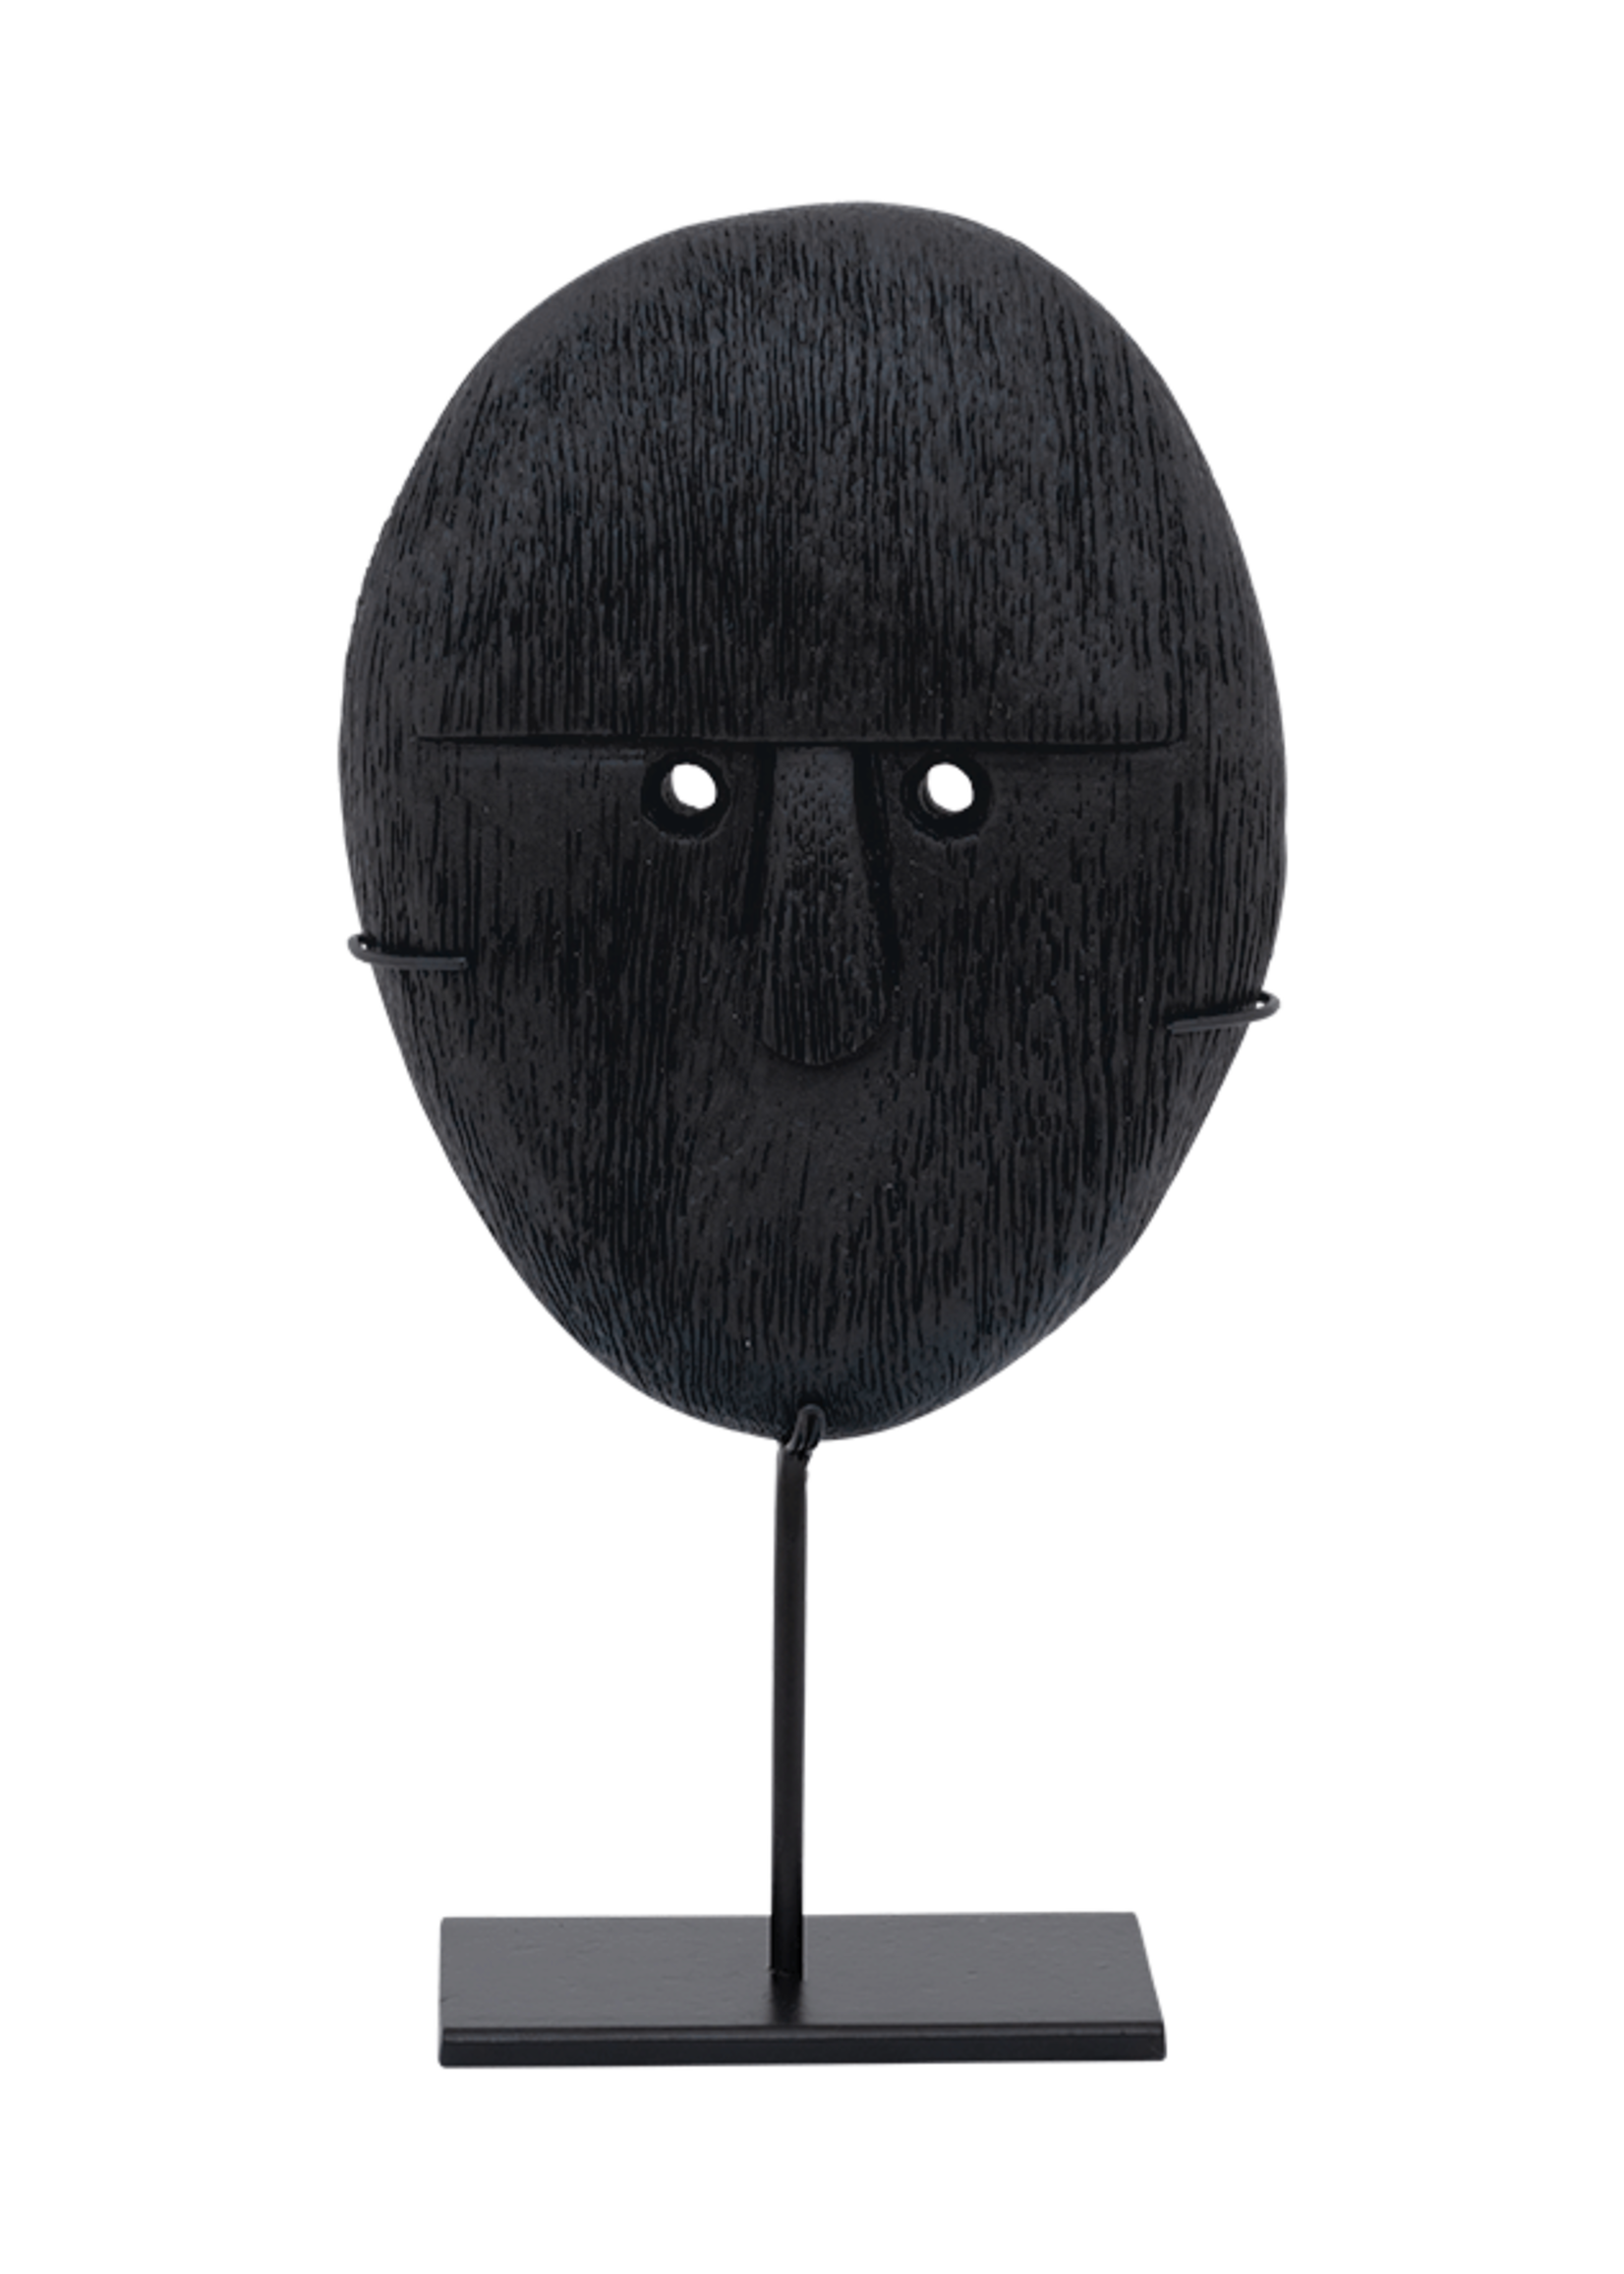 URBAN NATURE CULTURE URBAN NATURE CULTURE OBJECT MANGO WOOD HEAD ON STAND, 21CM